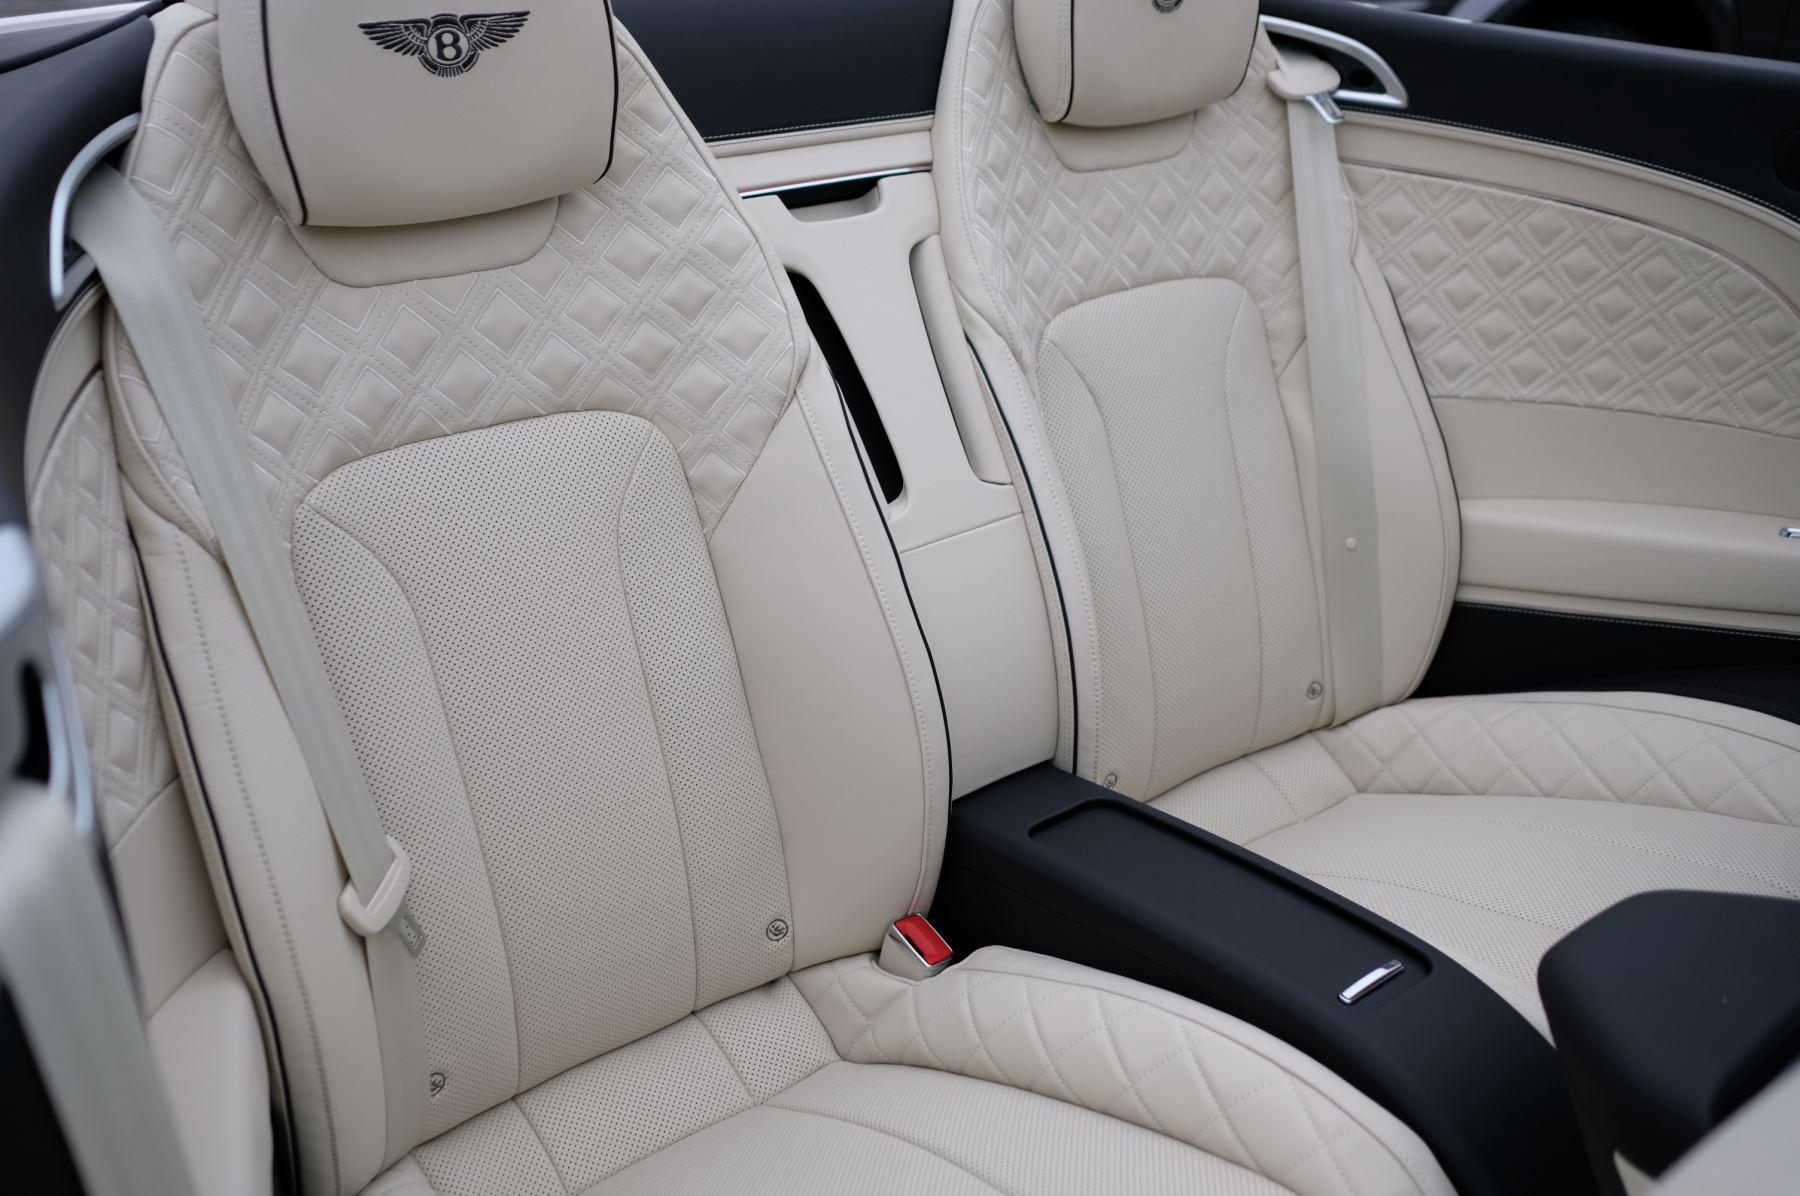 Bentley Continental GTC 4.0 V8 Mulliner Driving Spec 2dr Auto [Tour Spec] image 10